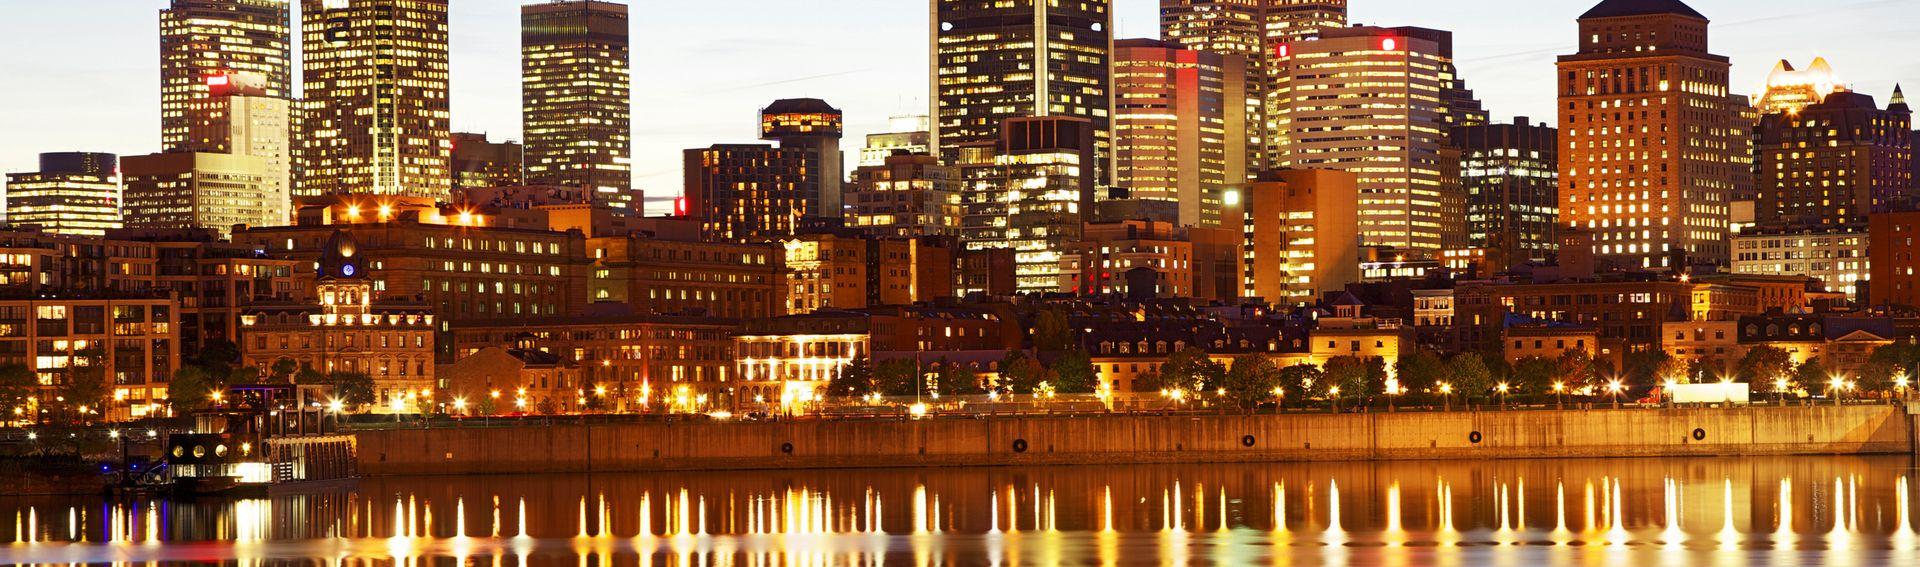 Montreal Surrounding